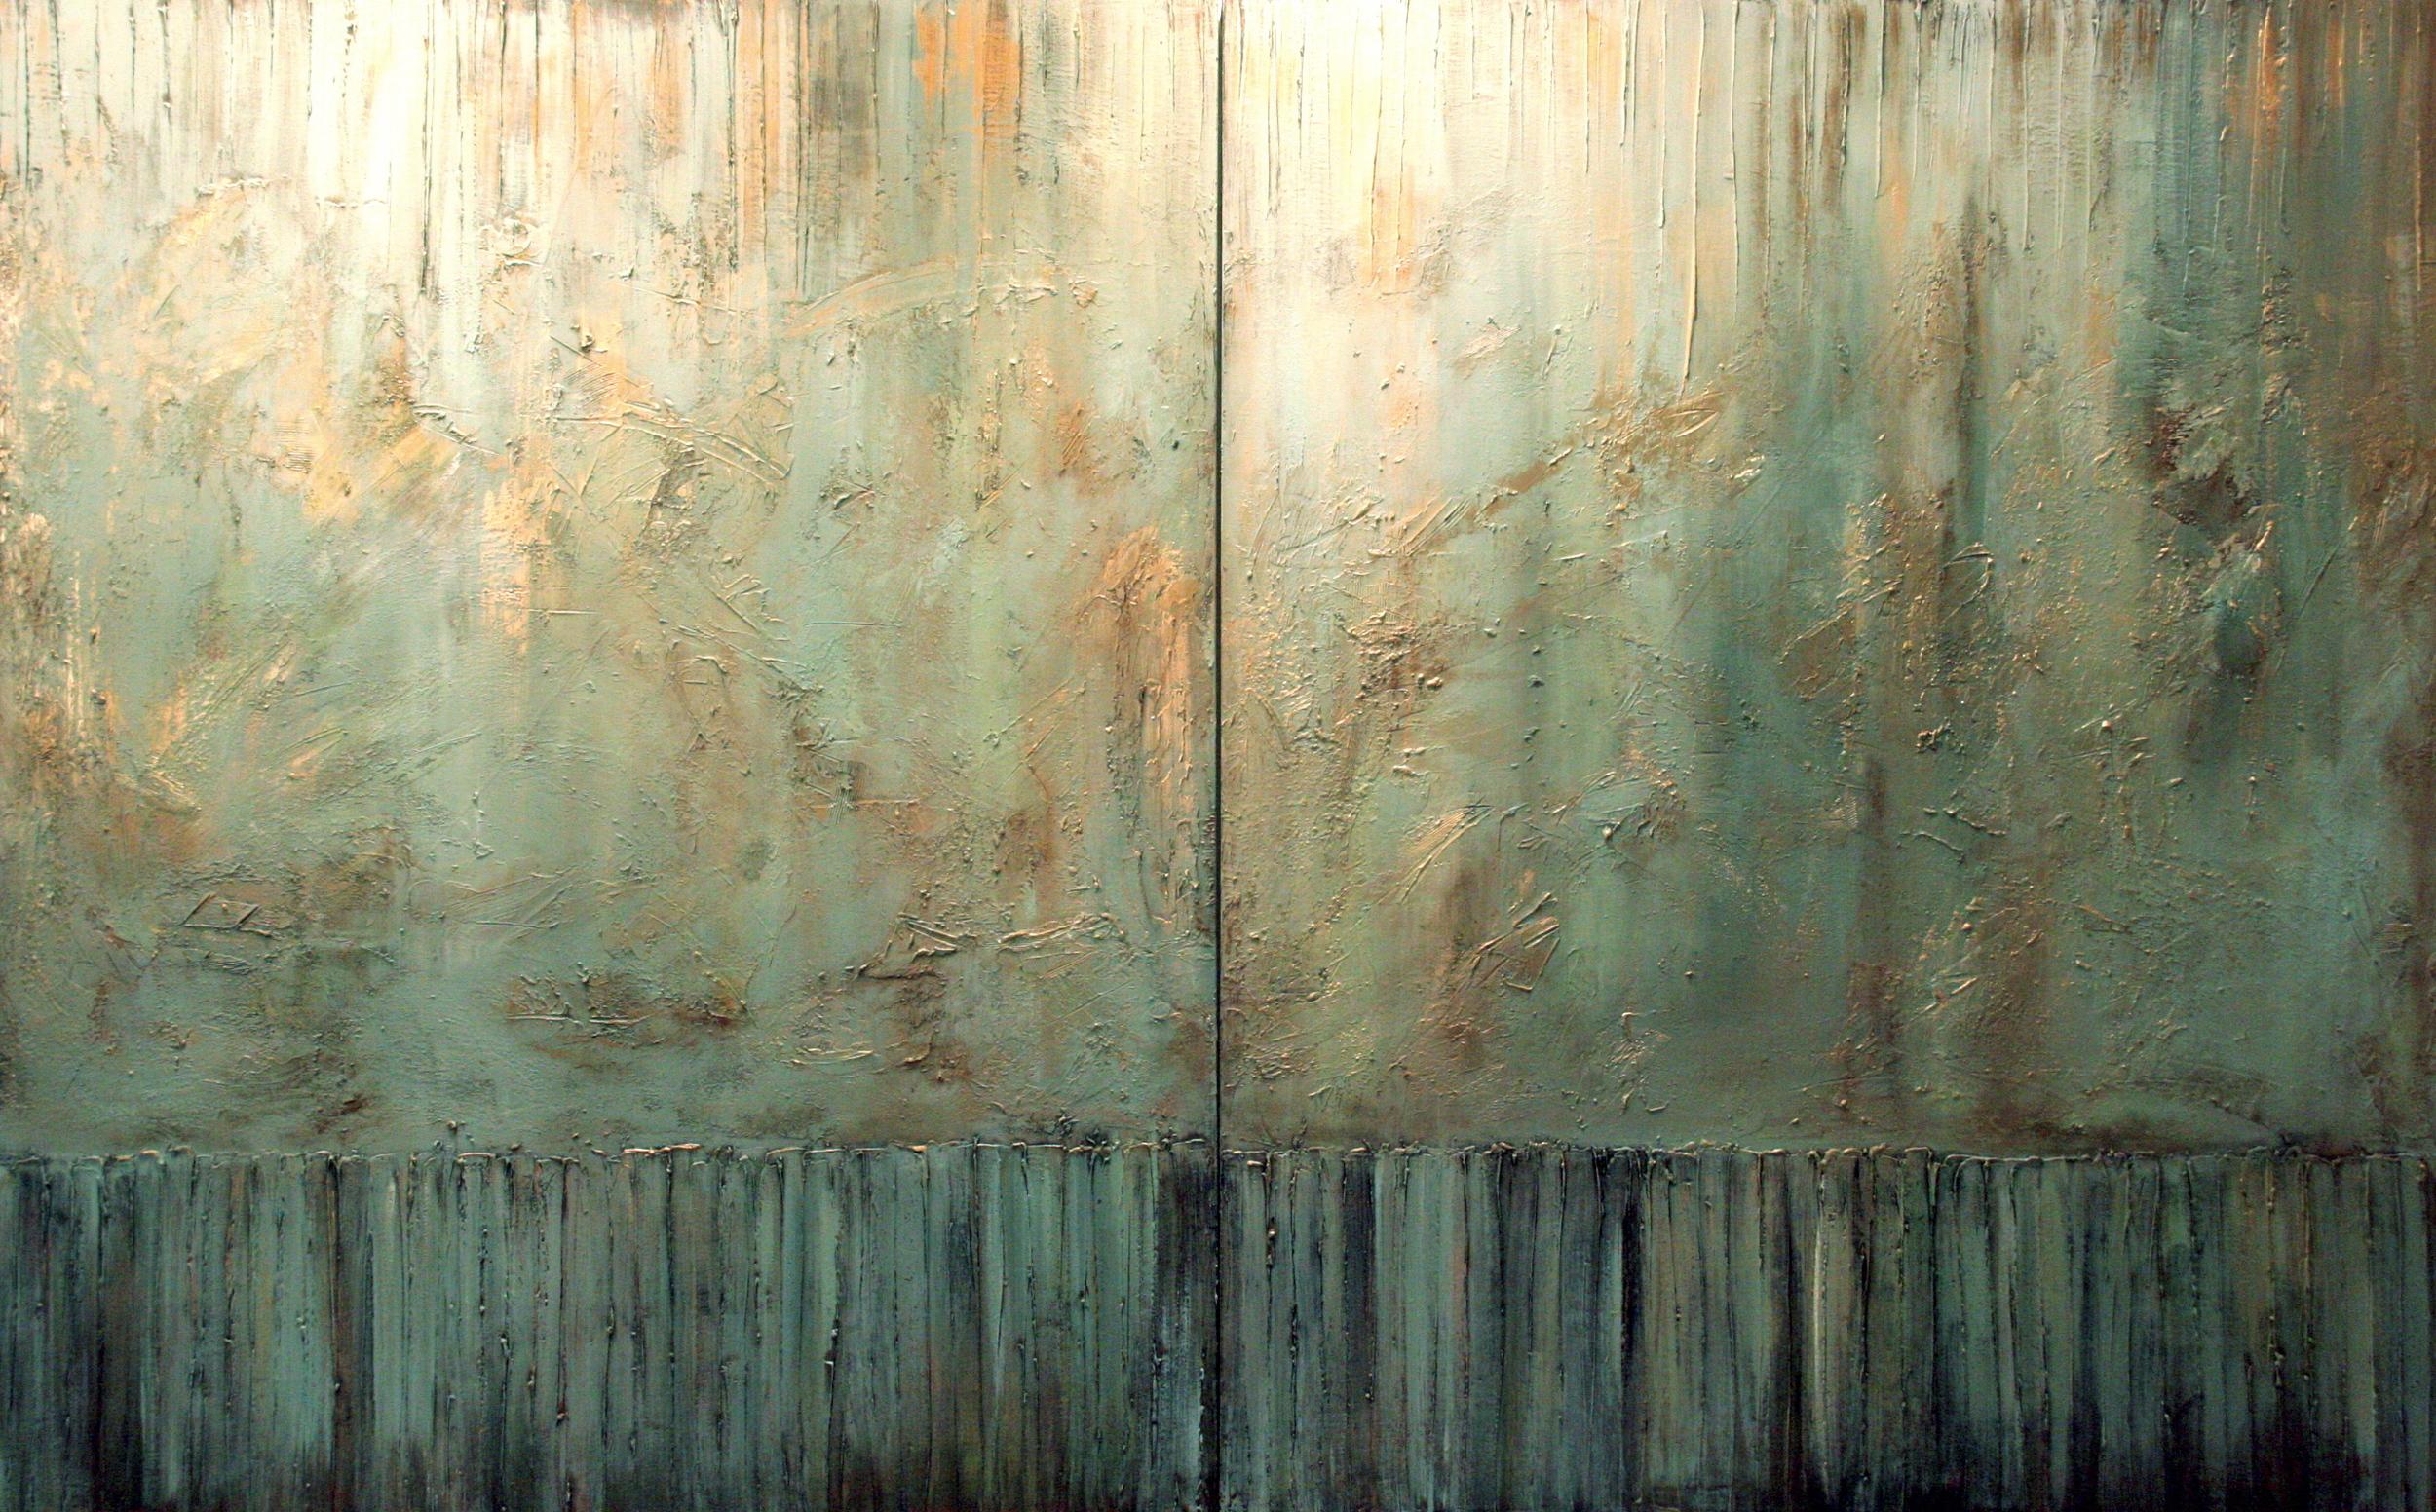 24. Anasazi Nights_2panels each 60x48_total60x96_mixed media on canvas_Leslie_Lemberg.jpg